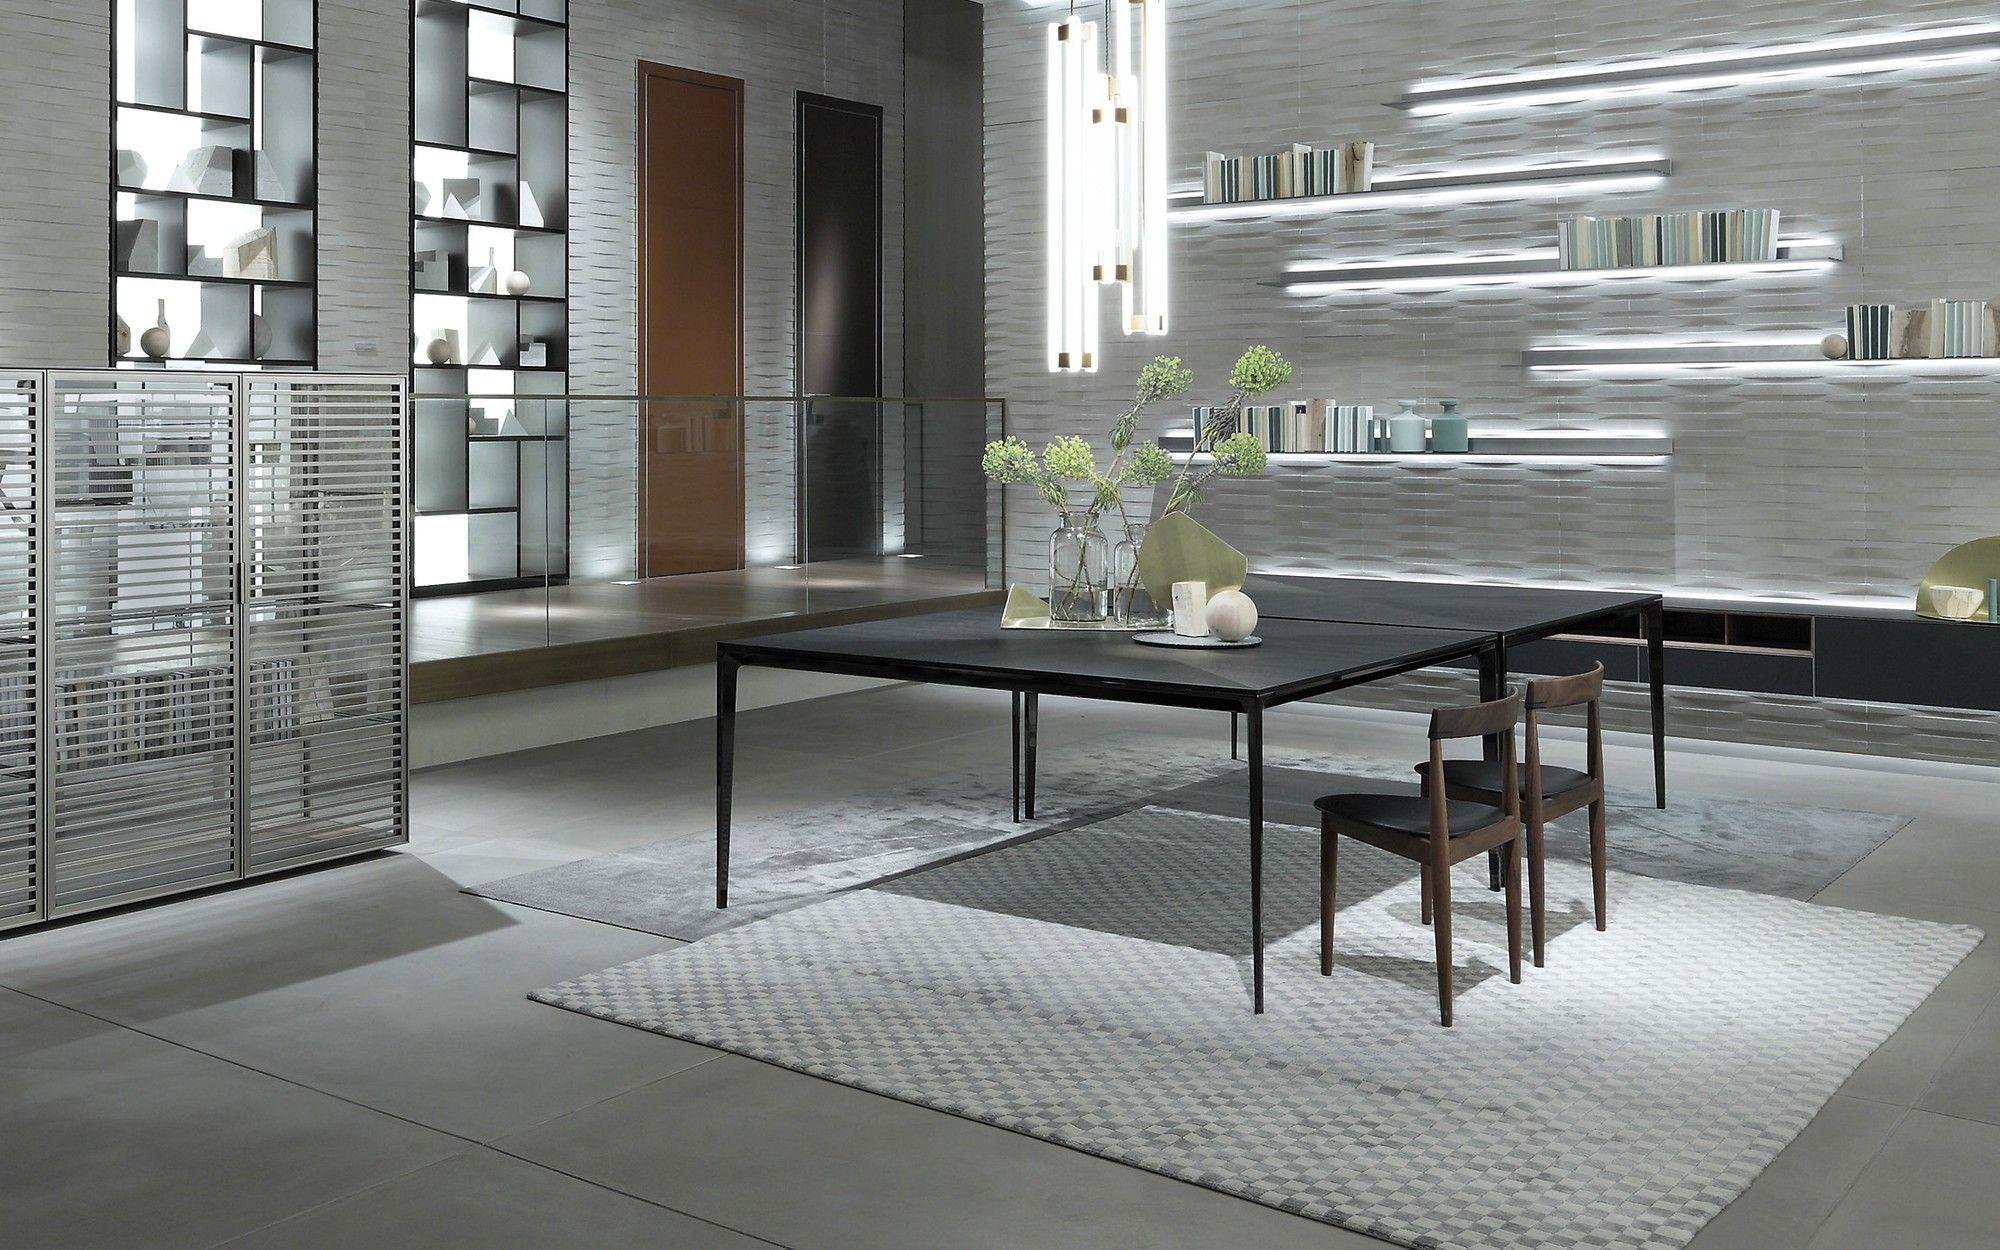 Tavolo Rimadesio ~ Rimadesio are global leaders in the design and manufacture of